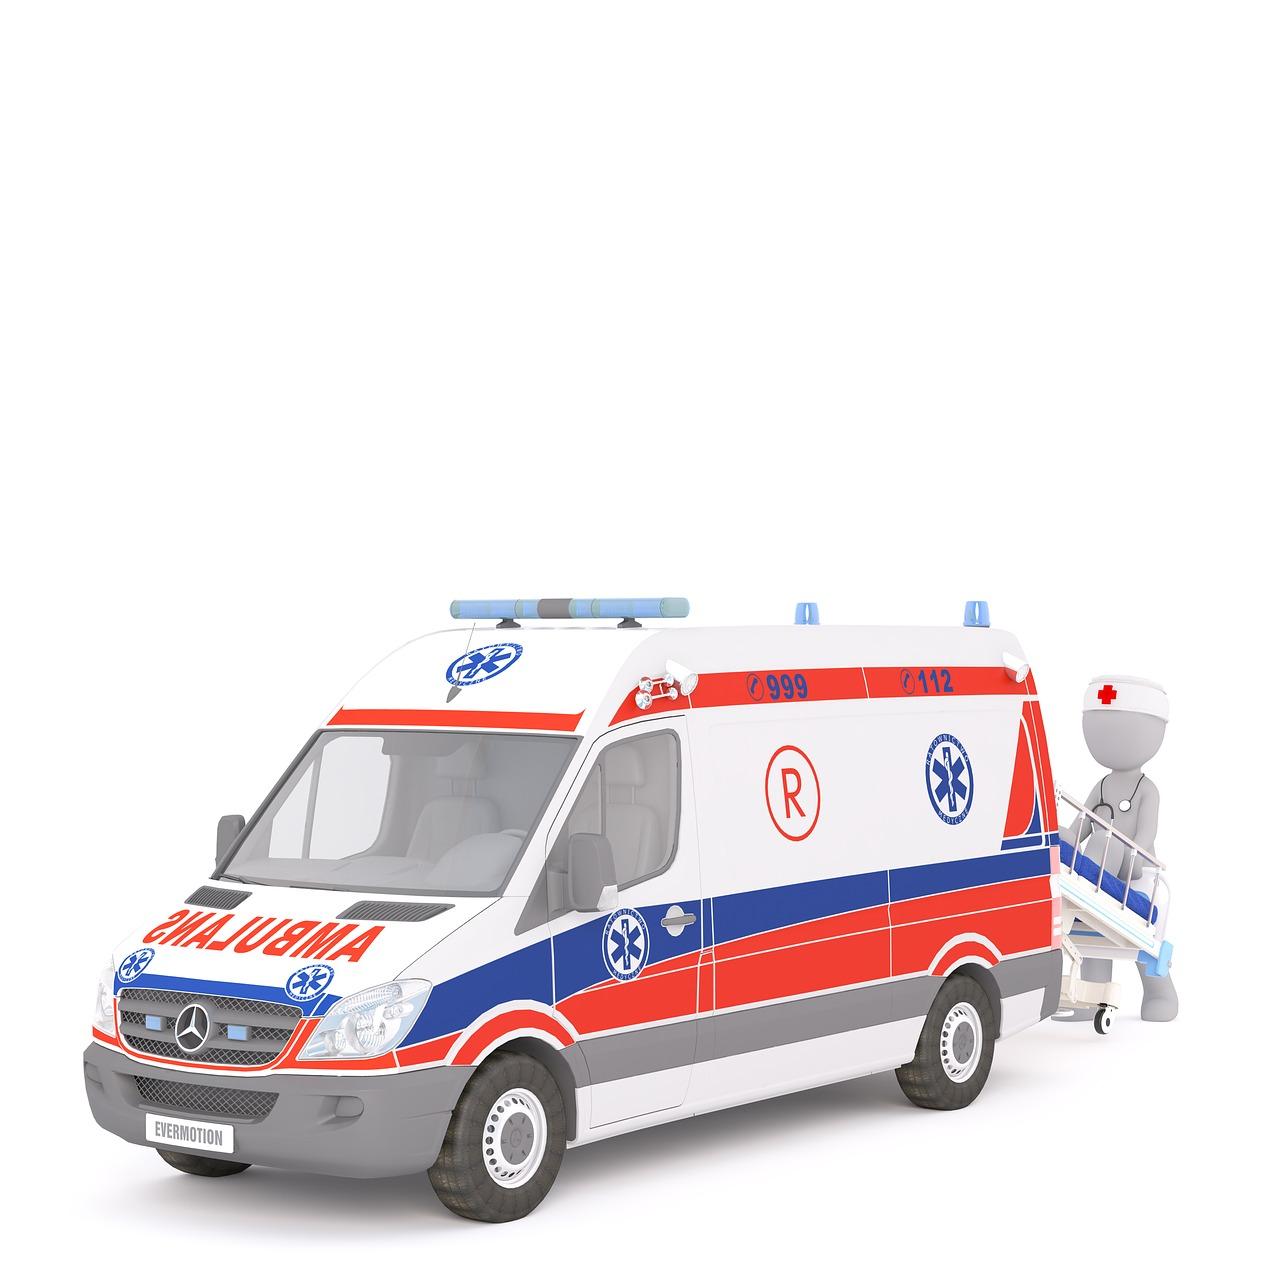 Krankenrückstransport